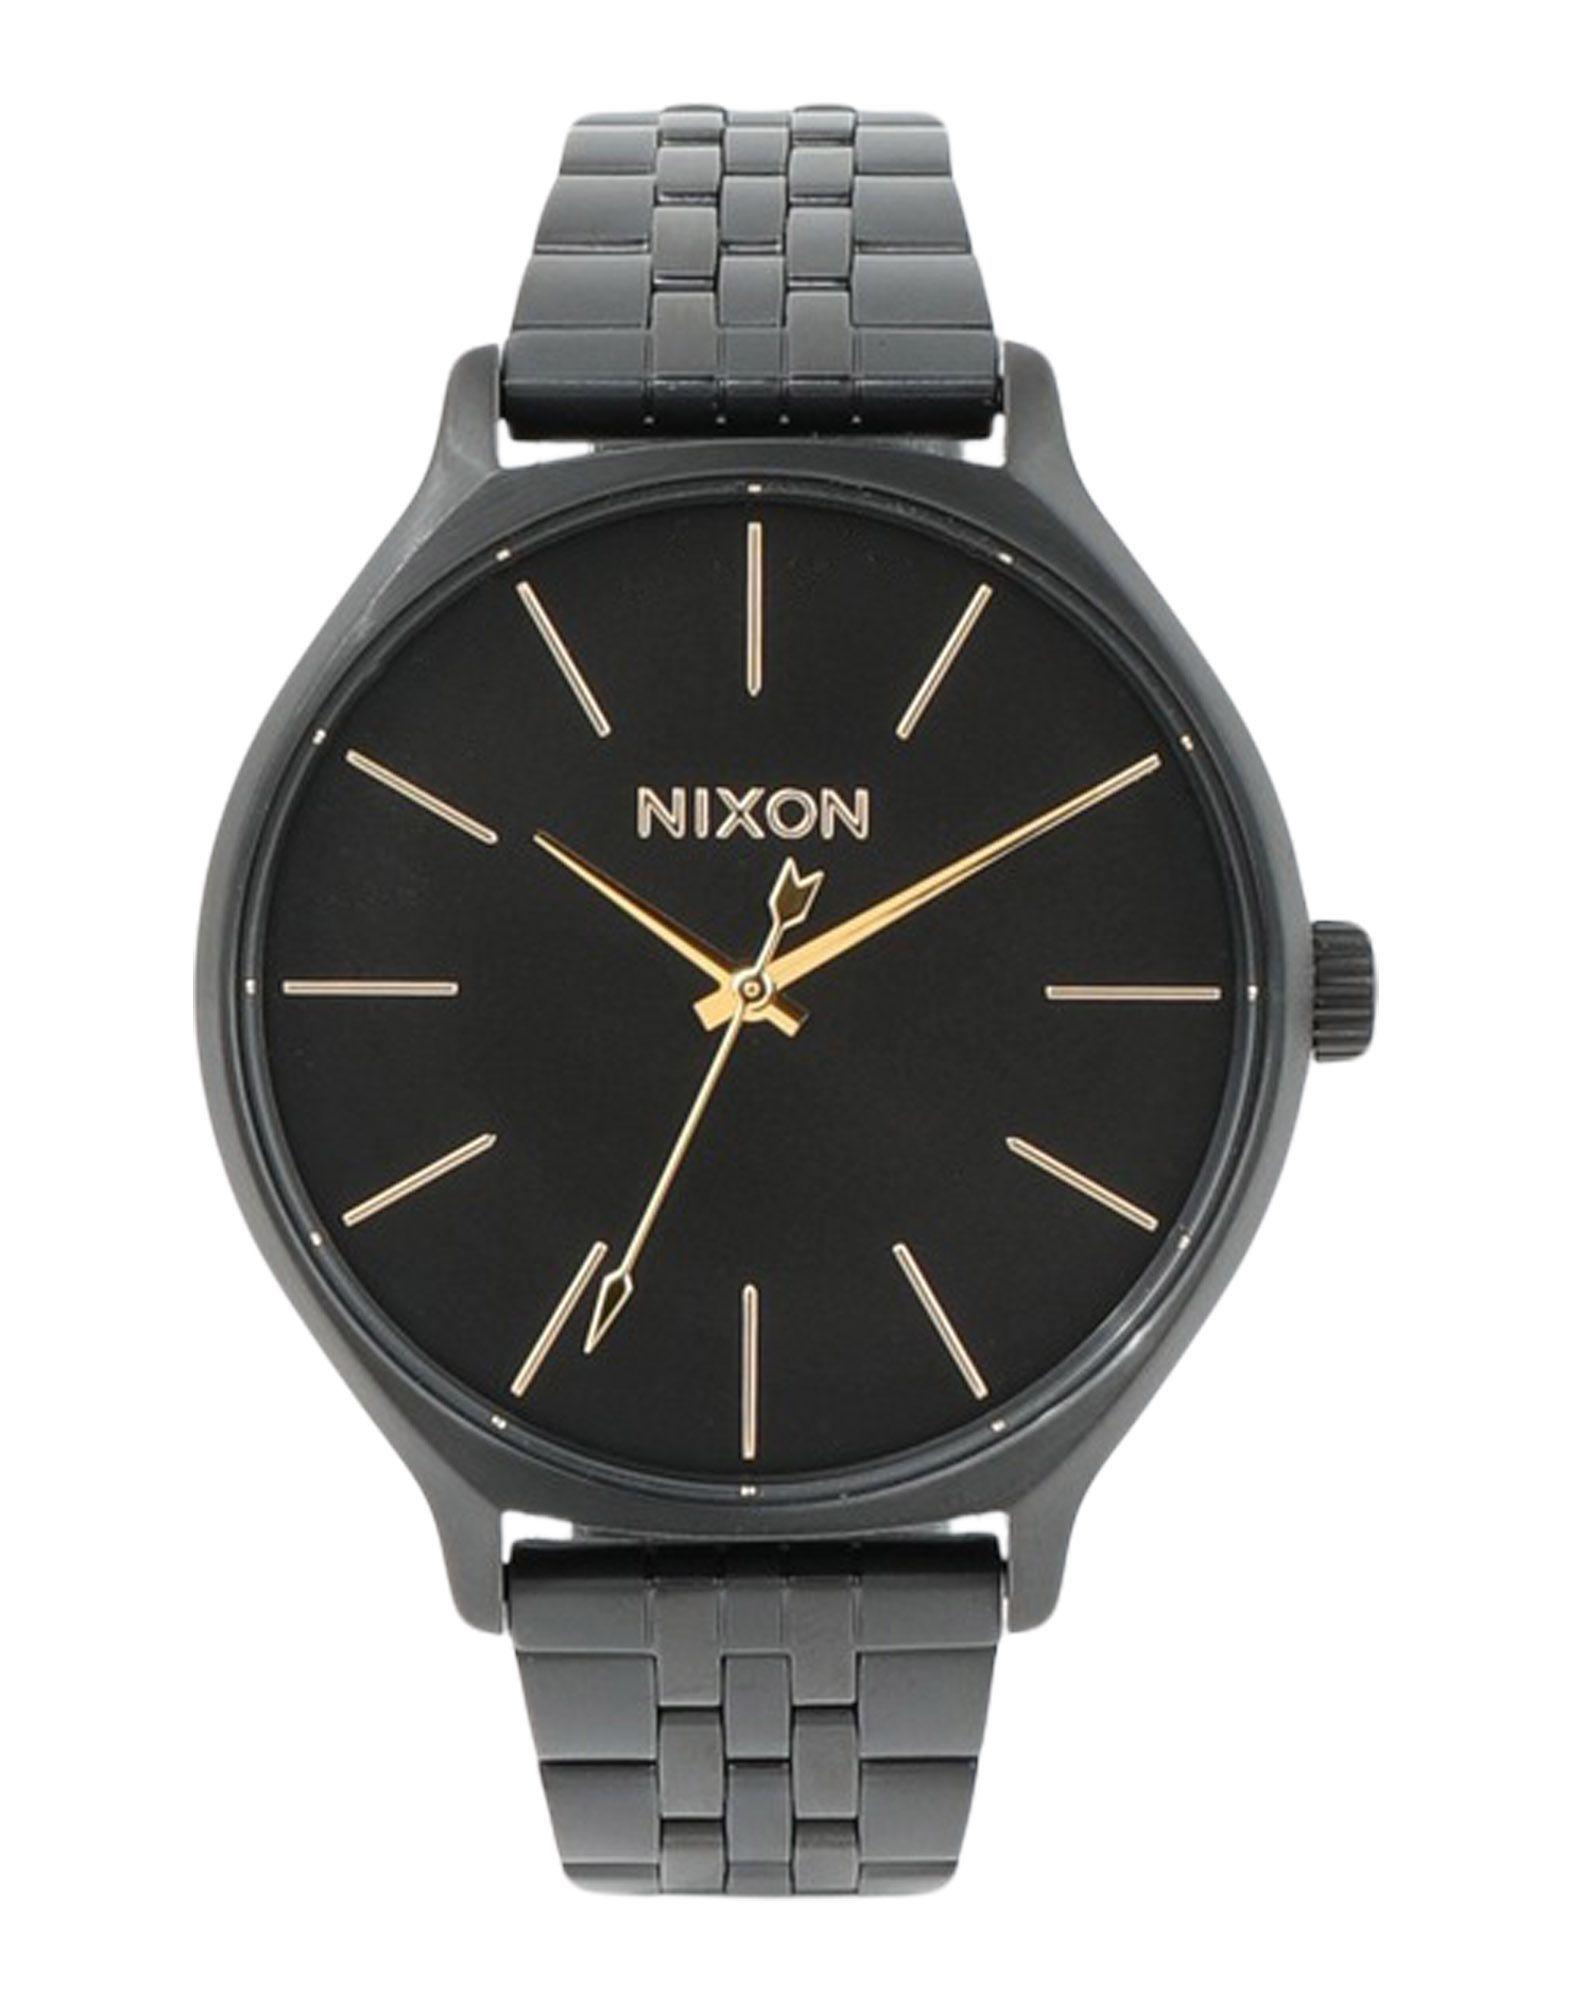 TIMEPIECES Unisex Nixon Black Stainless Steel